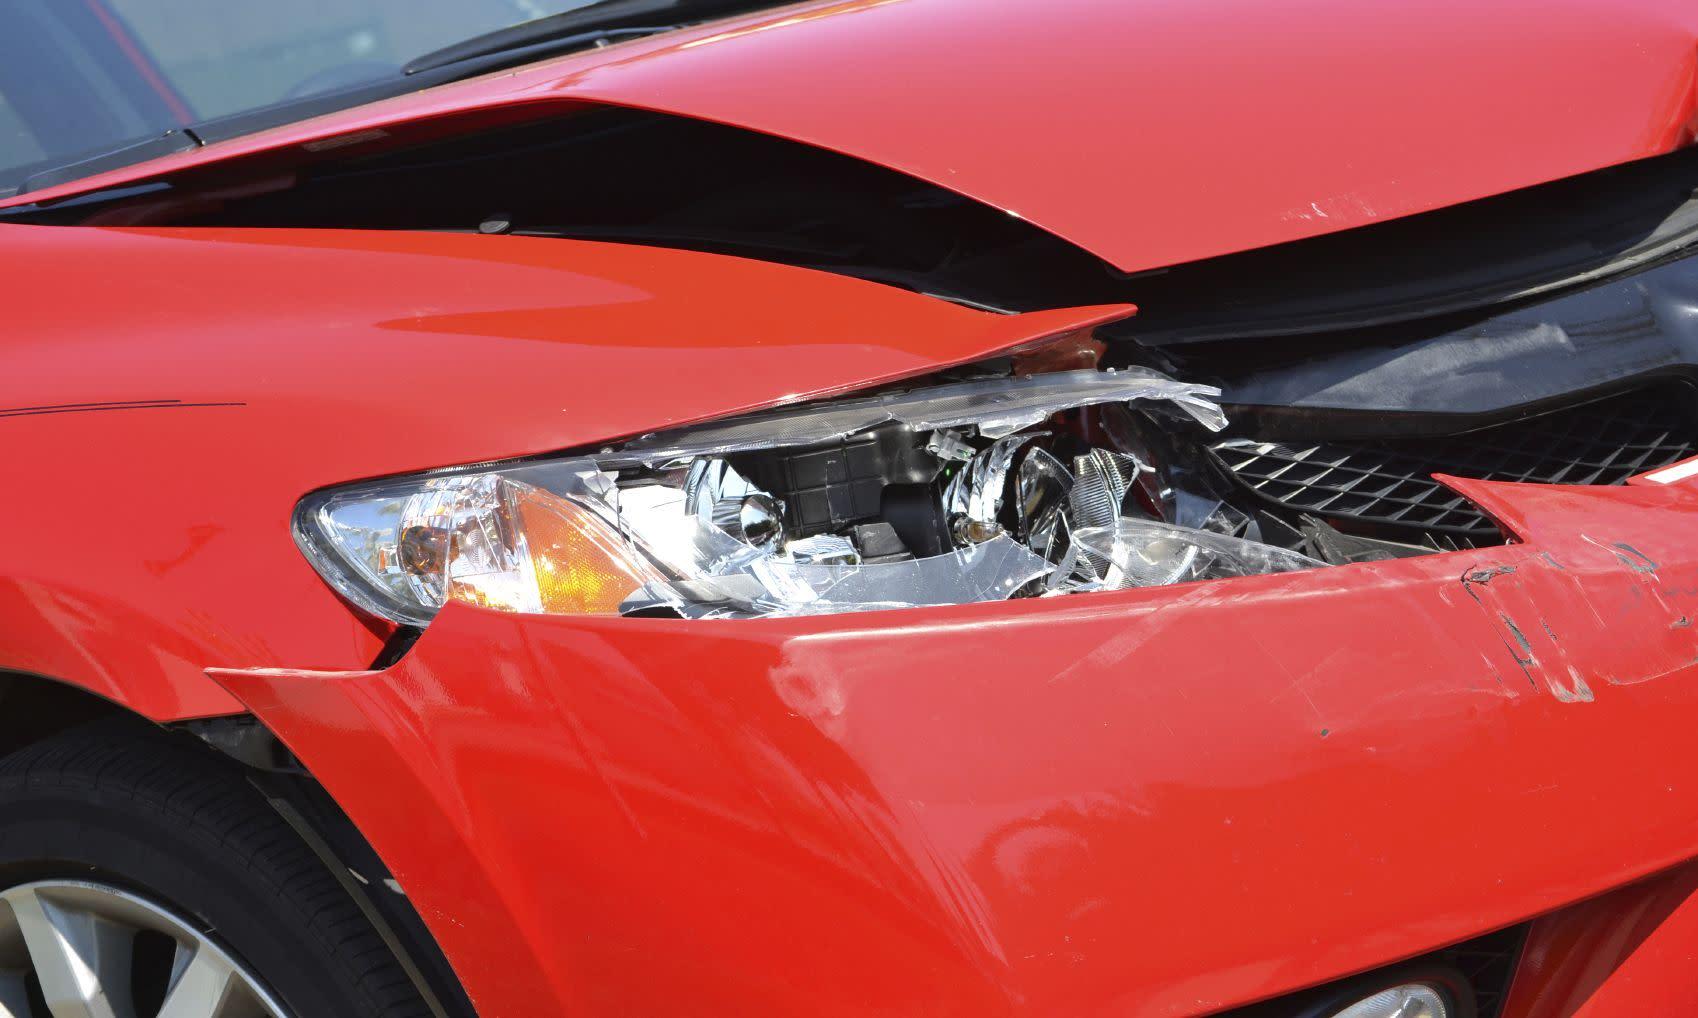 Chevrolet Collision Repair near Flint, MI